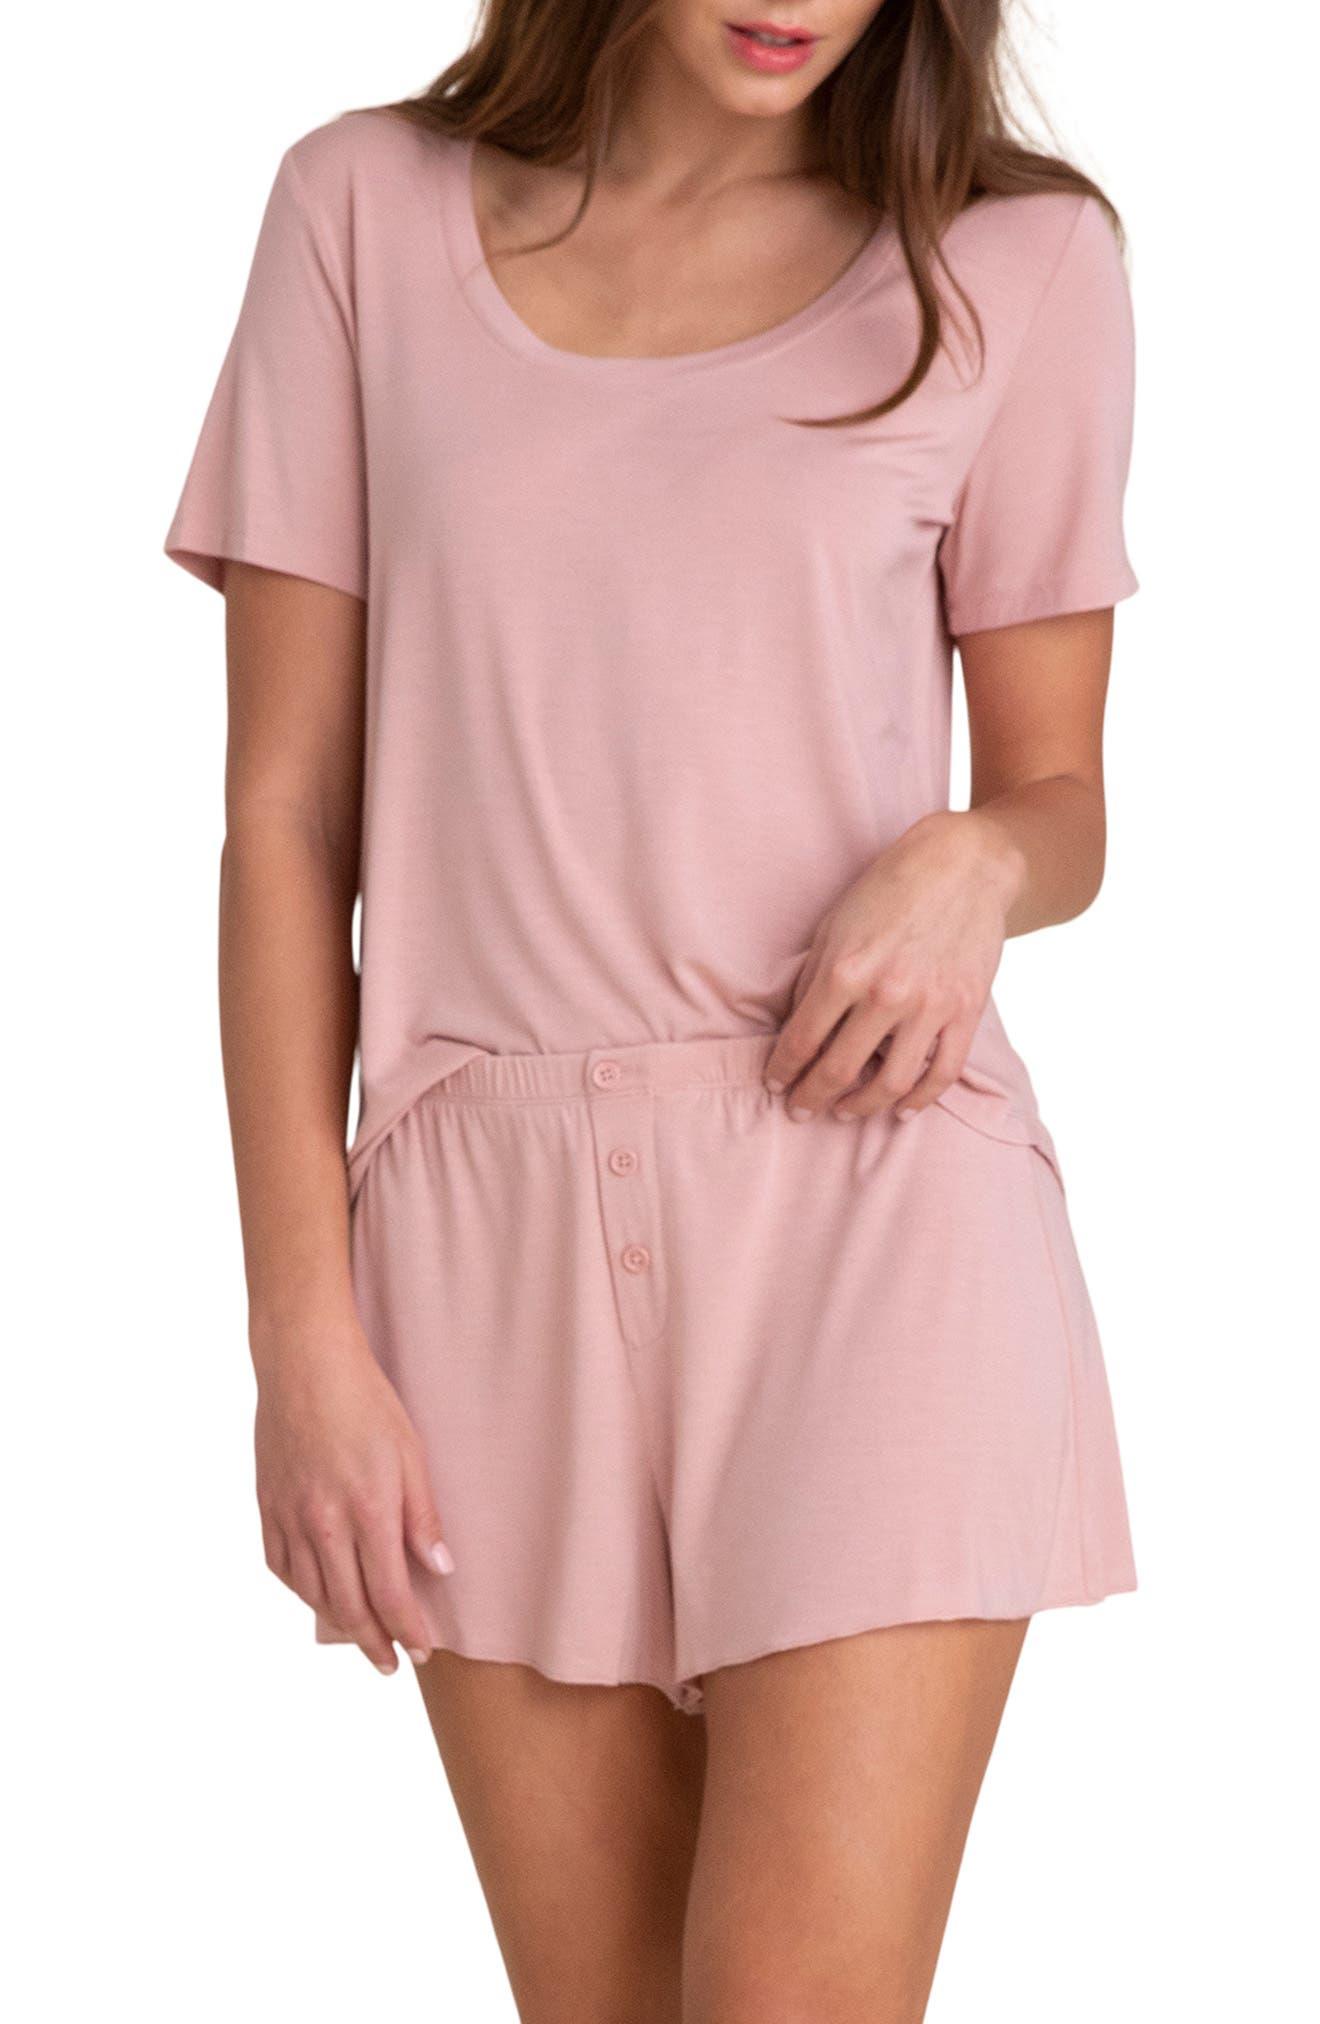 Women's Barefoot Dreams Luxe Jersey Short Pajamas